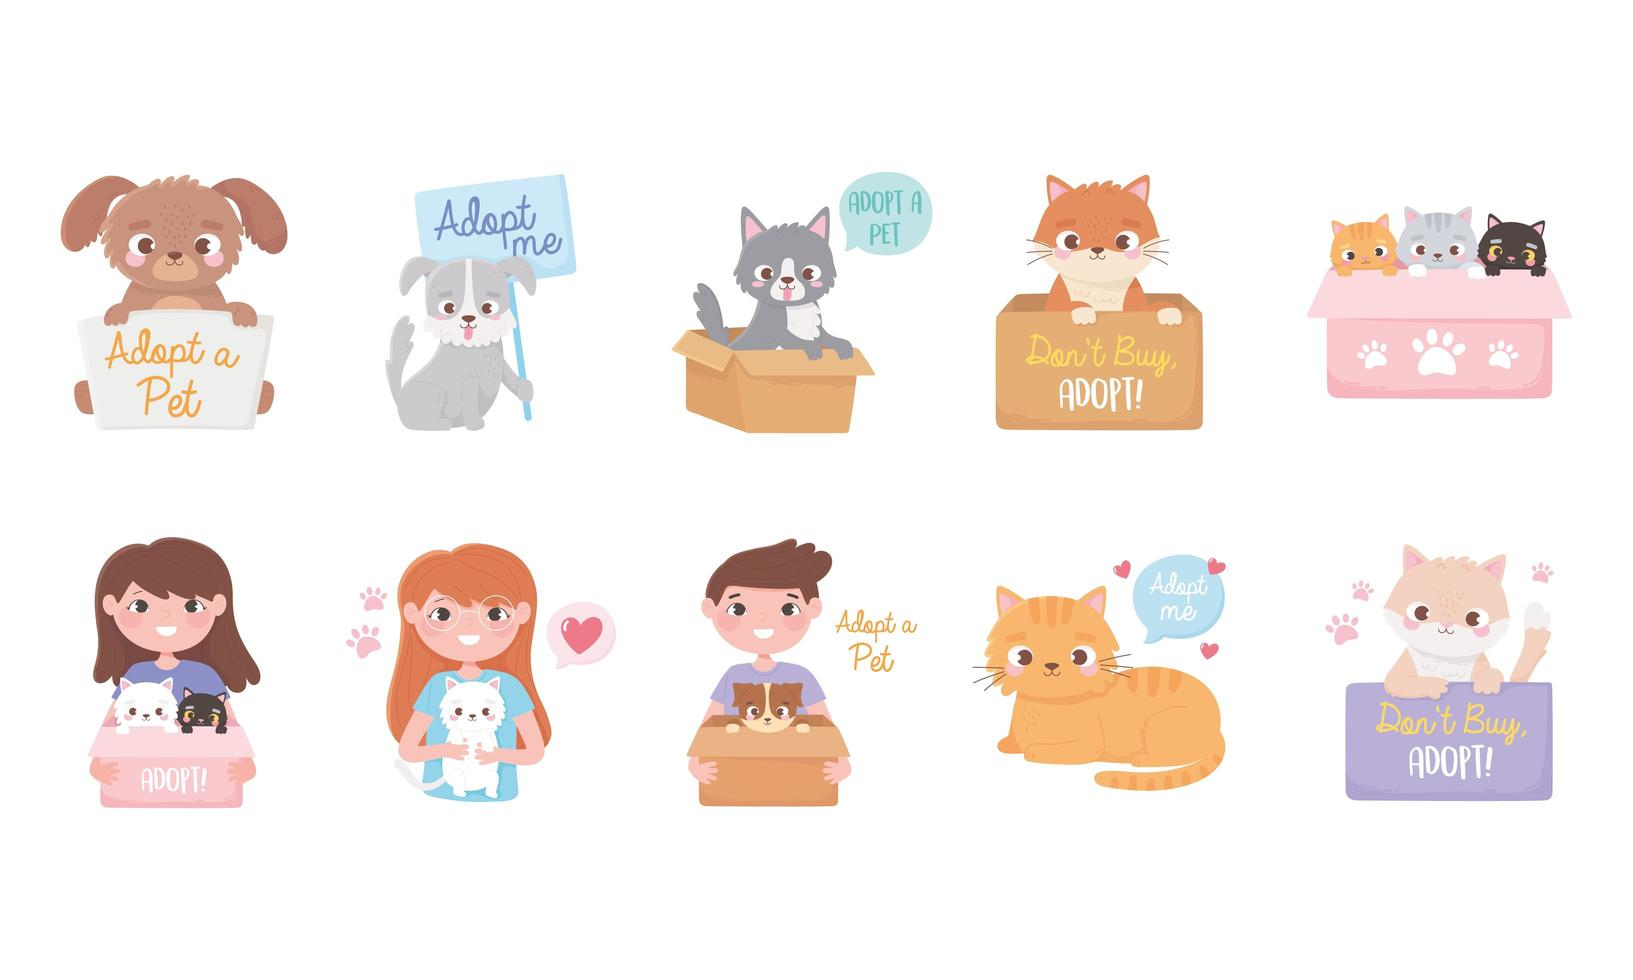 huisdier adoptie pictogramserie vector